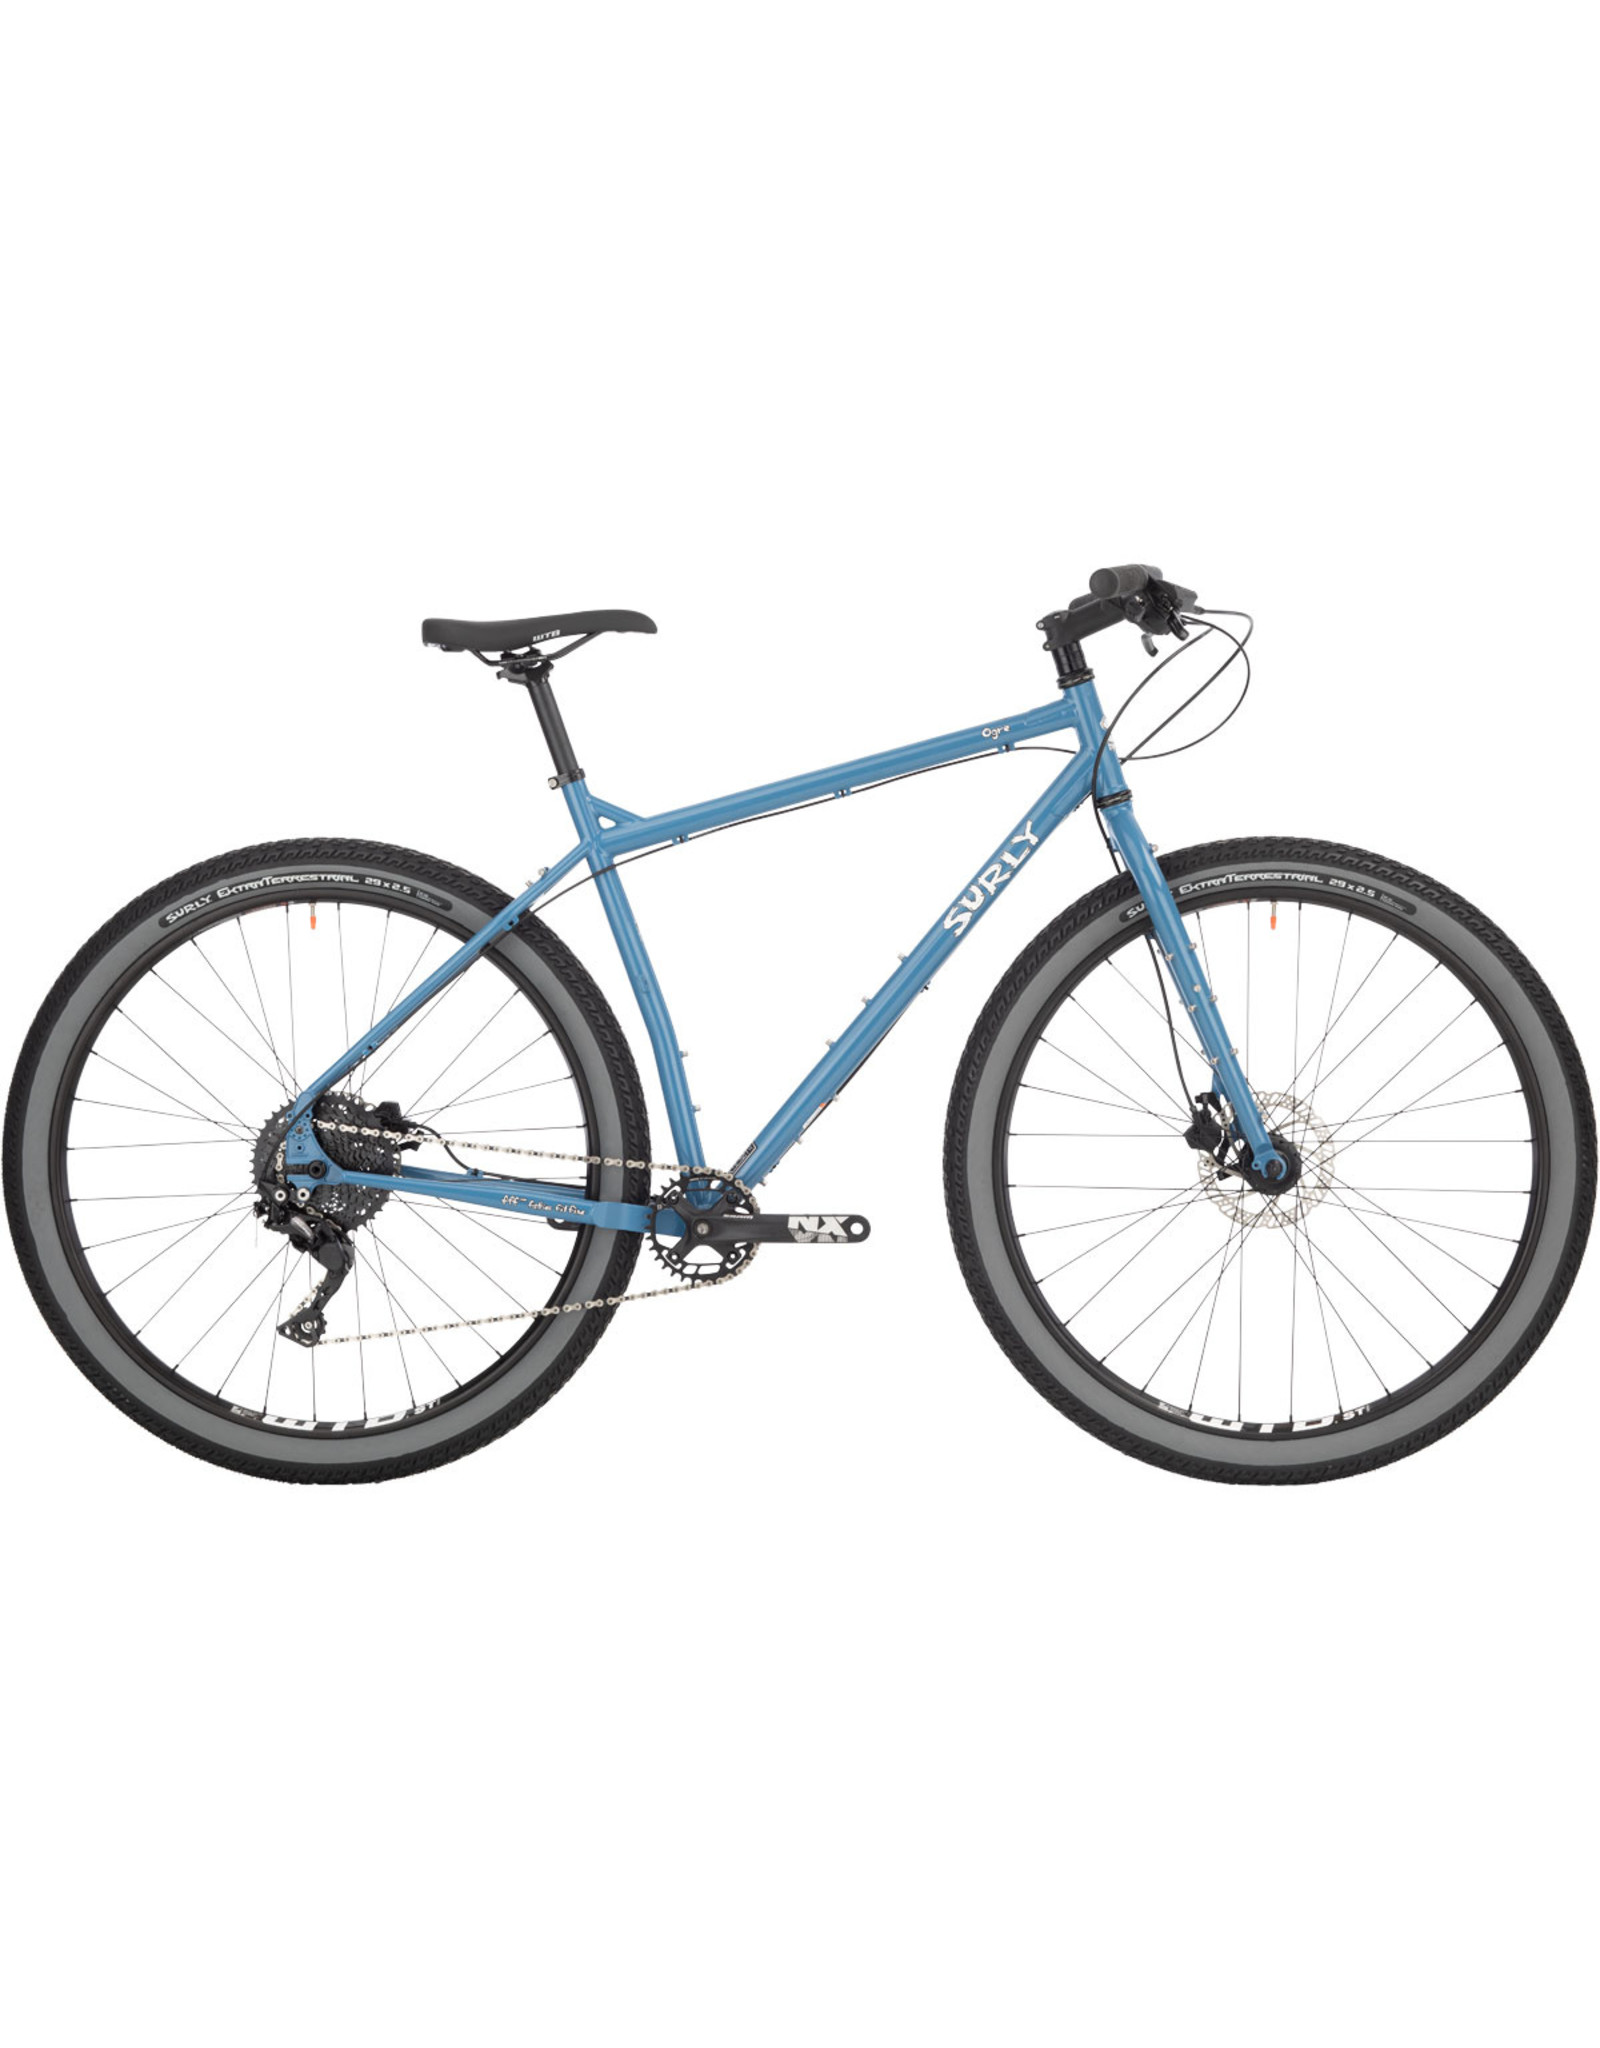 Surly Bikes Surly Ogre